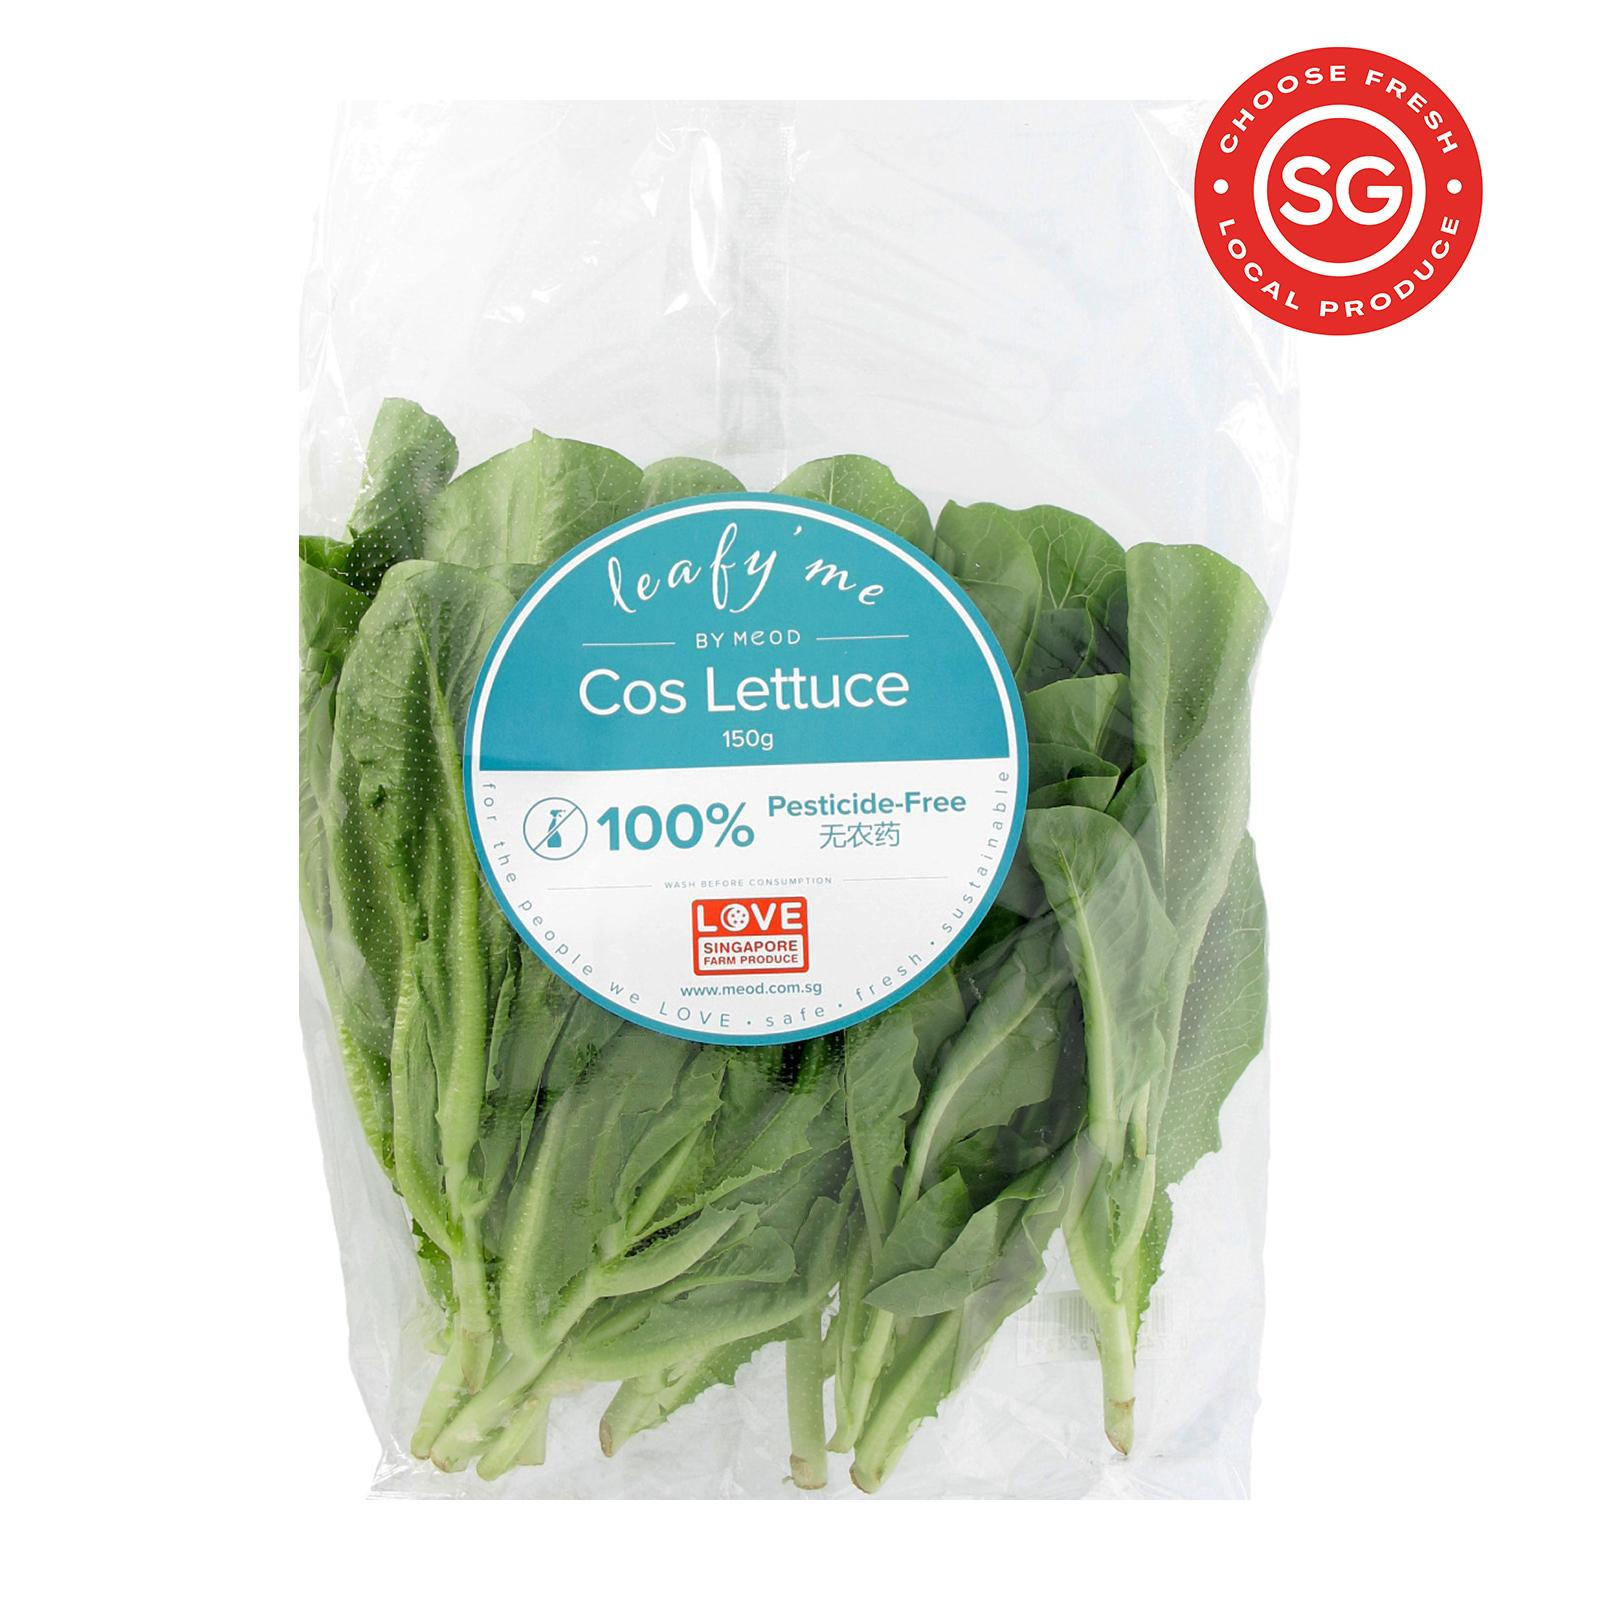 MEOD Leafy'Me Cos Lettuce